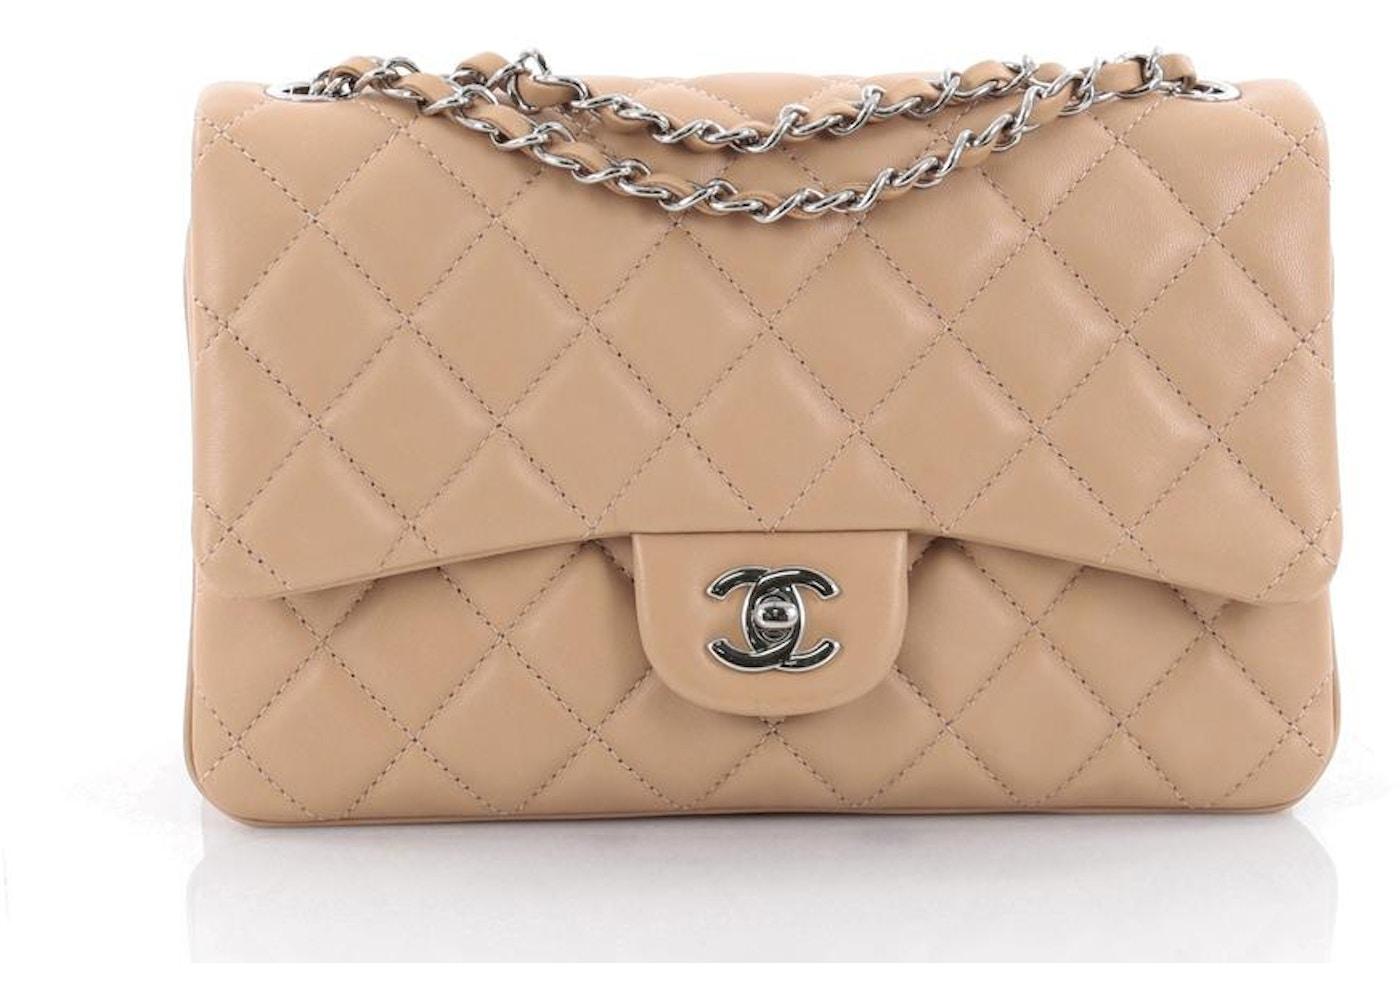 Chanel Bag Flap Quilted Diamond Medium